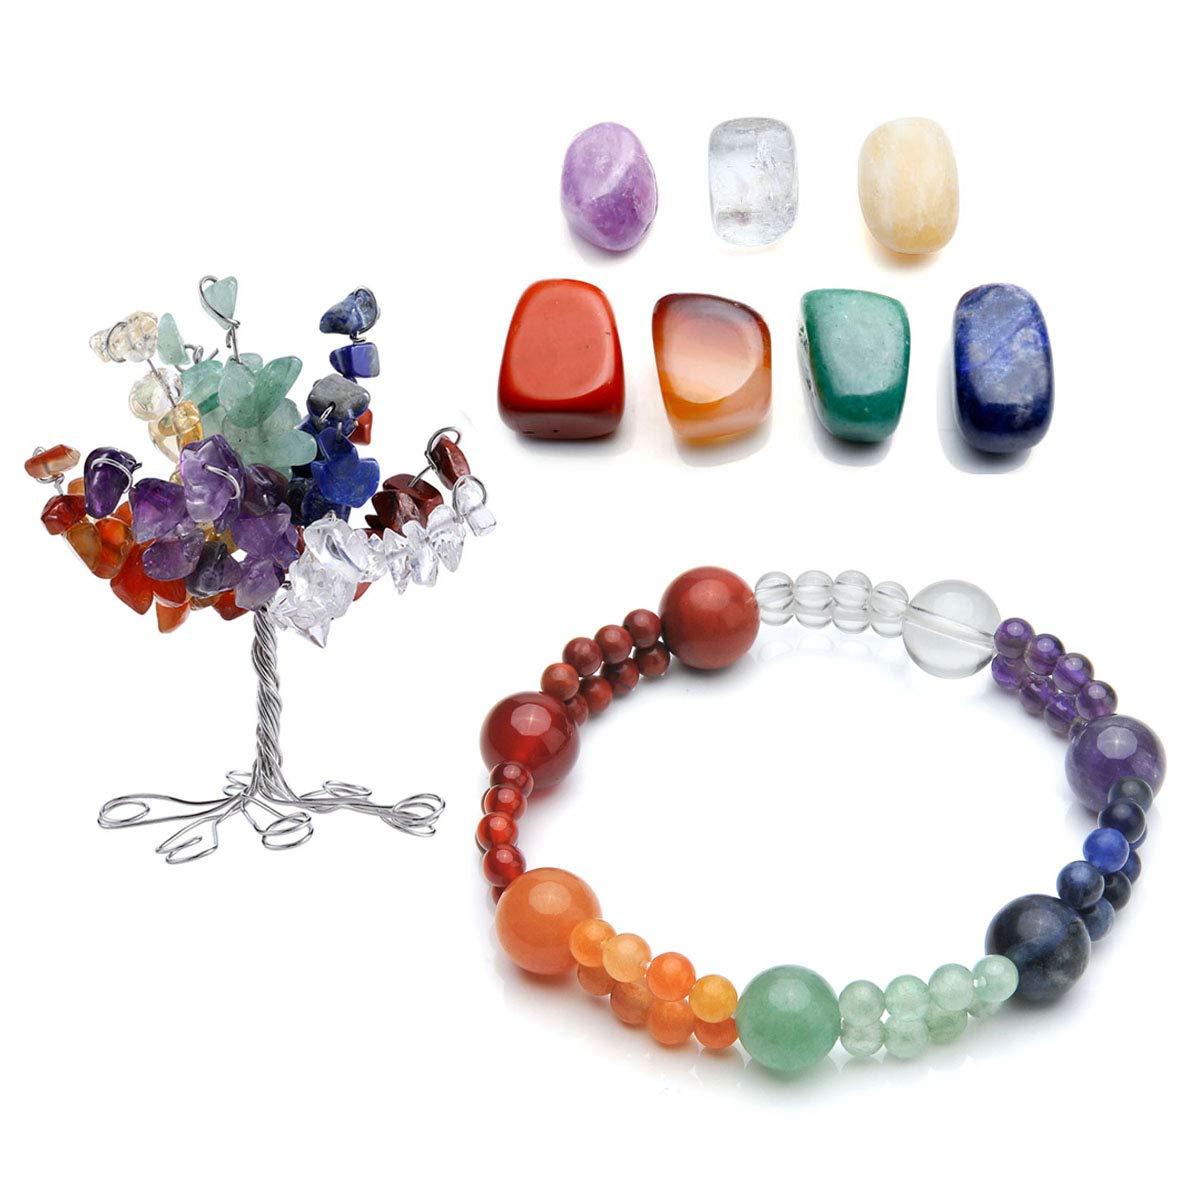 CrystalTears 7 Chakra Gems Tree Life Set,Money Tree+ Irregular Chakra Stones+ Chakra Brarcelet Tree Pendant Reiki Healing Feng Shui Spiritual Decor Ornaments